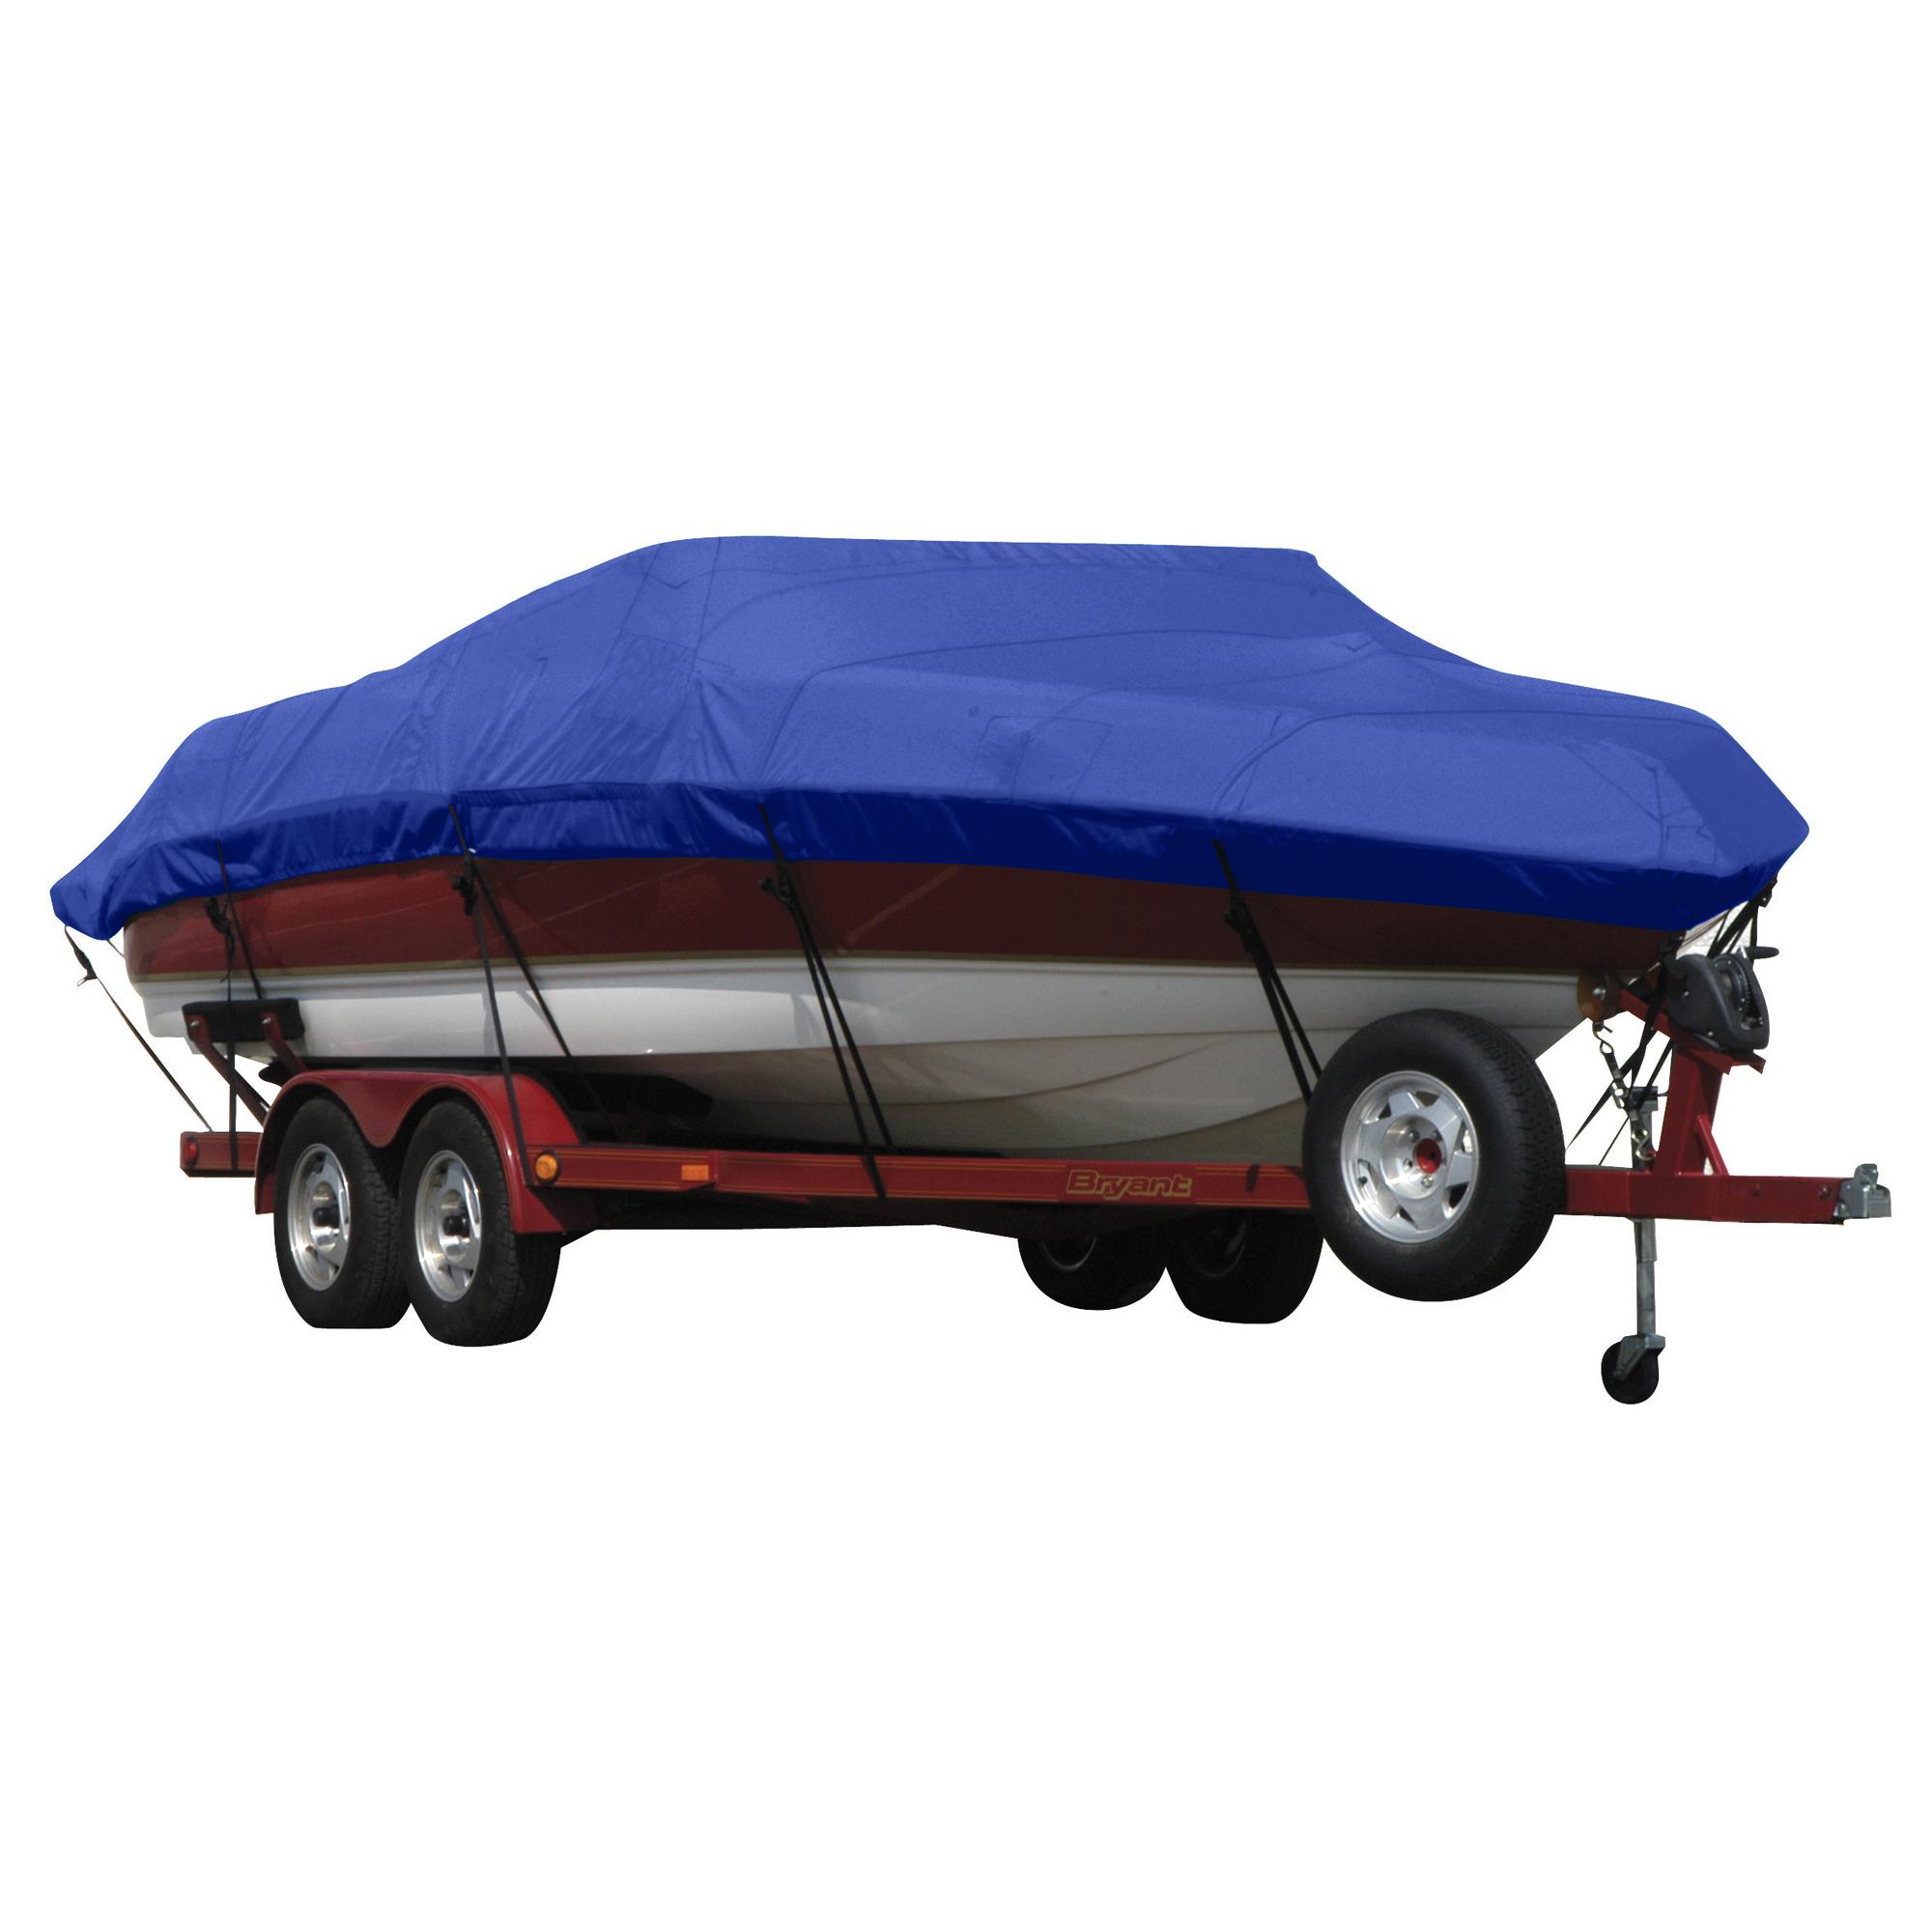 Exact Fit Covermate Sunbrella Boat Cover for Princecraft Super Pro 176 Super Pro 176 Fish N Promenade W/Ski Rope Guard O/B. Ocean Blue